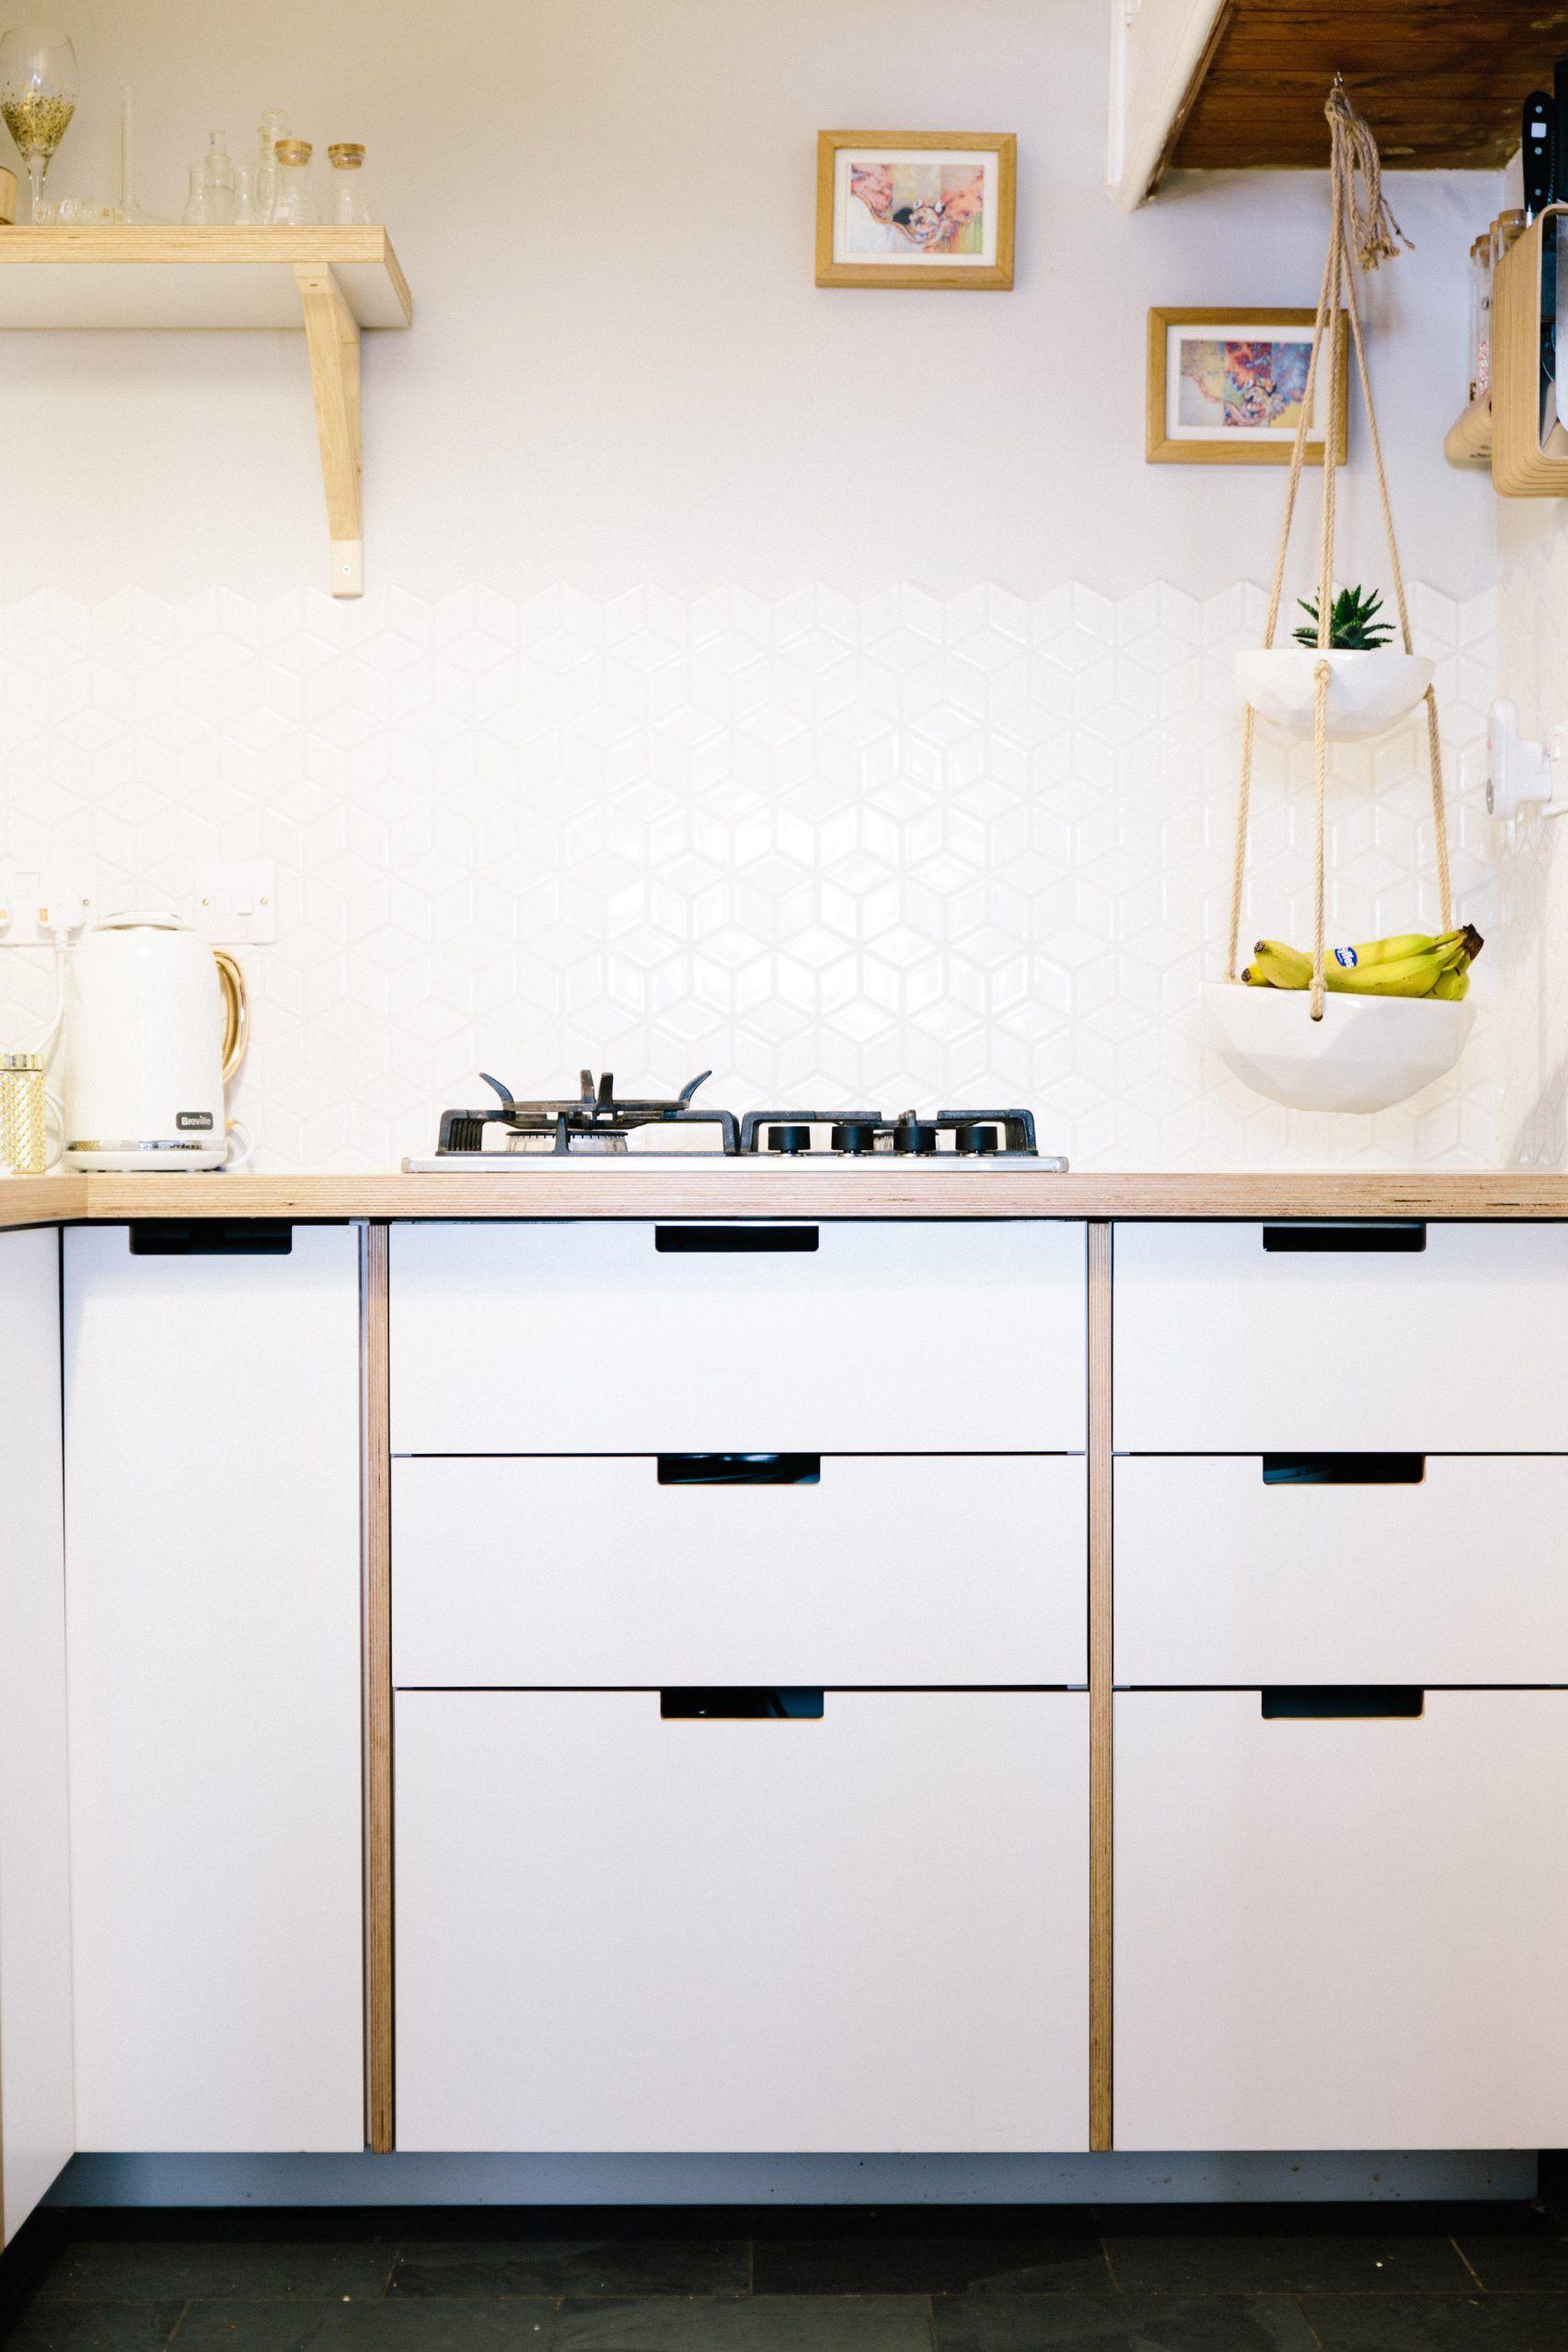 Plykea Hacks Ikea S Metod Kitchens With Plywood Fronts In 2020 Ikea Metod Kitchen Plywood Kitchen Ikea Kitchen Doors